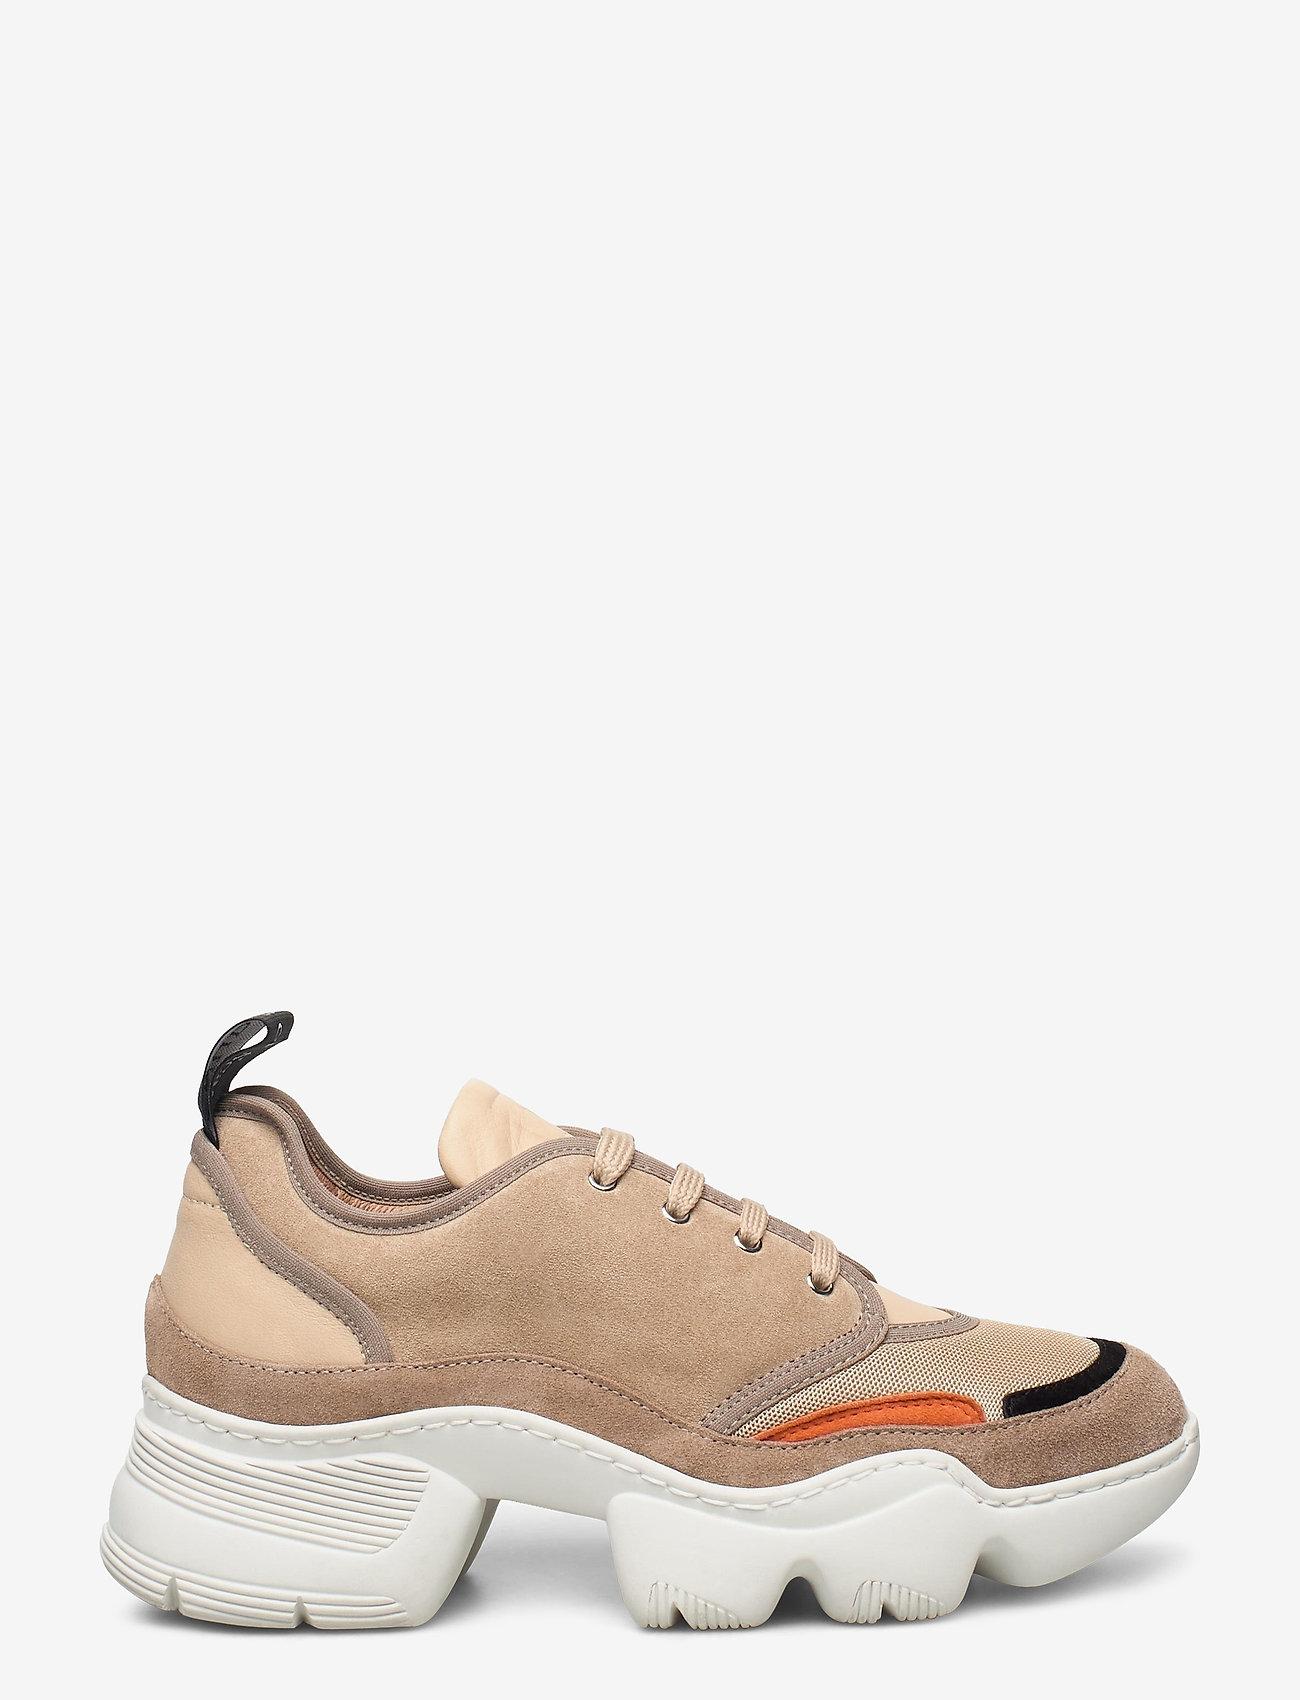 Nude of Scandinavia - SIBYL - chunky sneakers - mix / beige - 1